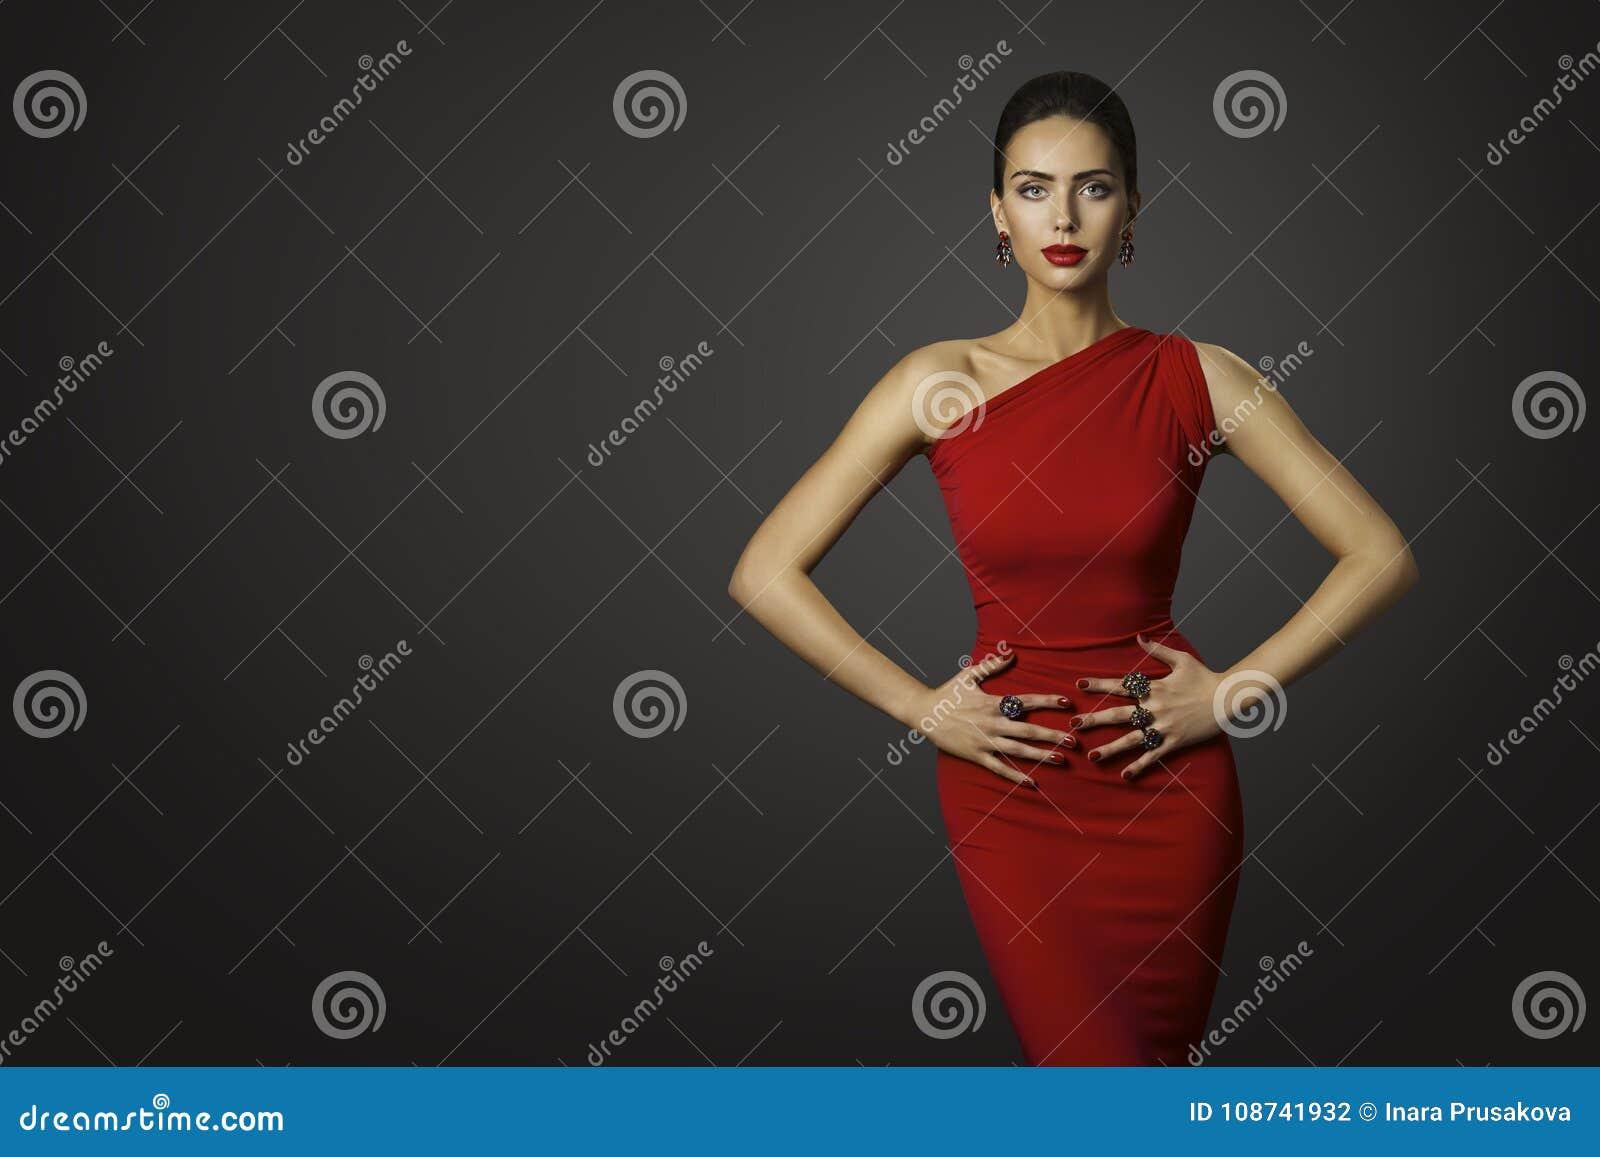 Mode-Modell Red Dress, elegante Frau im sexy Abend-Kleid